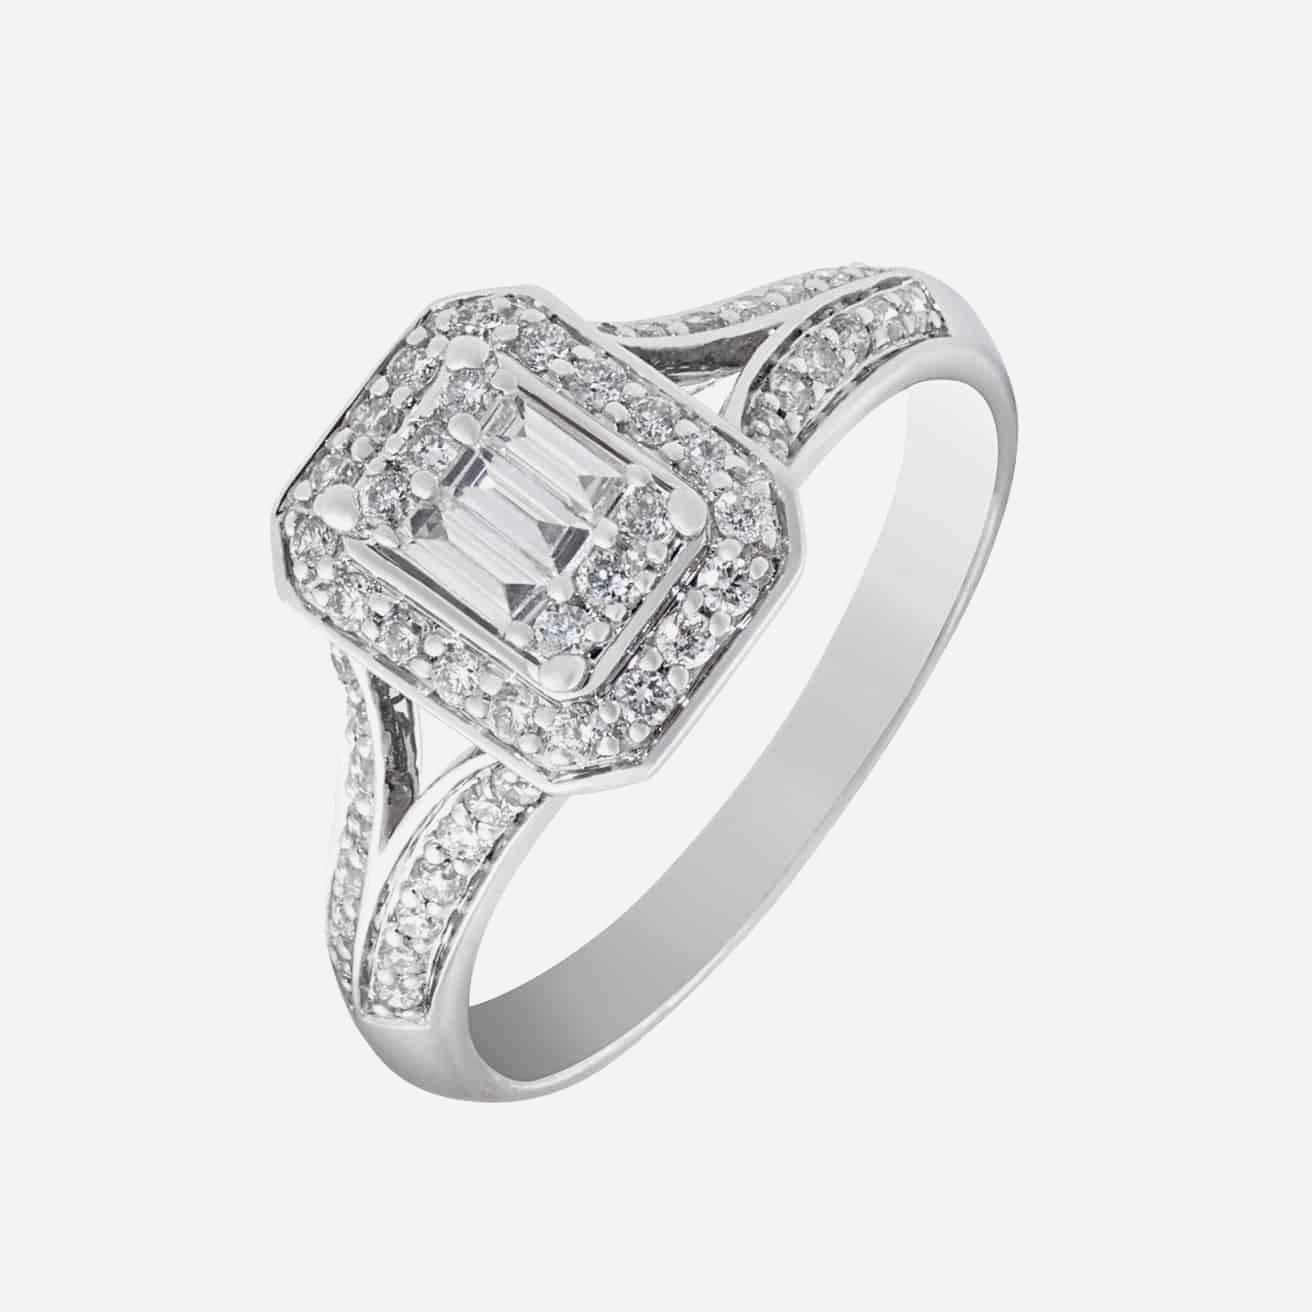 Beautiful Diamond Rings Under 200 – Depoisdevoar With Engagement Rings Under 200 (Gallery 13 of 15)